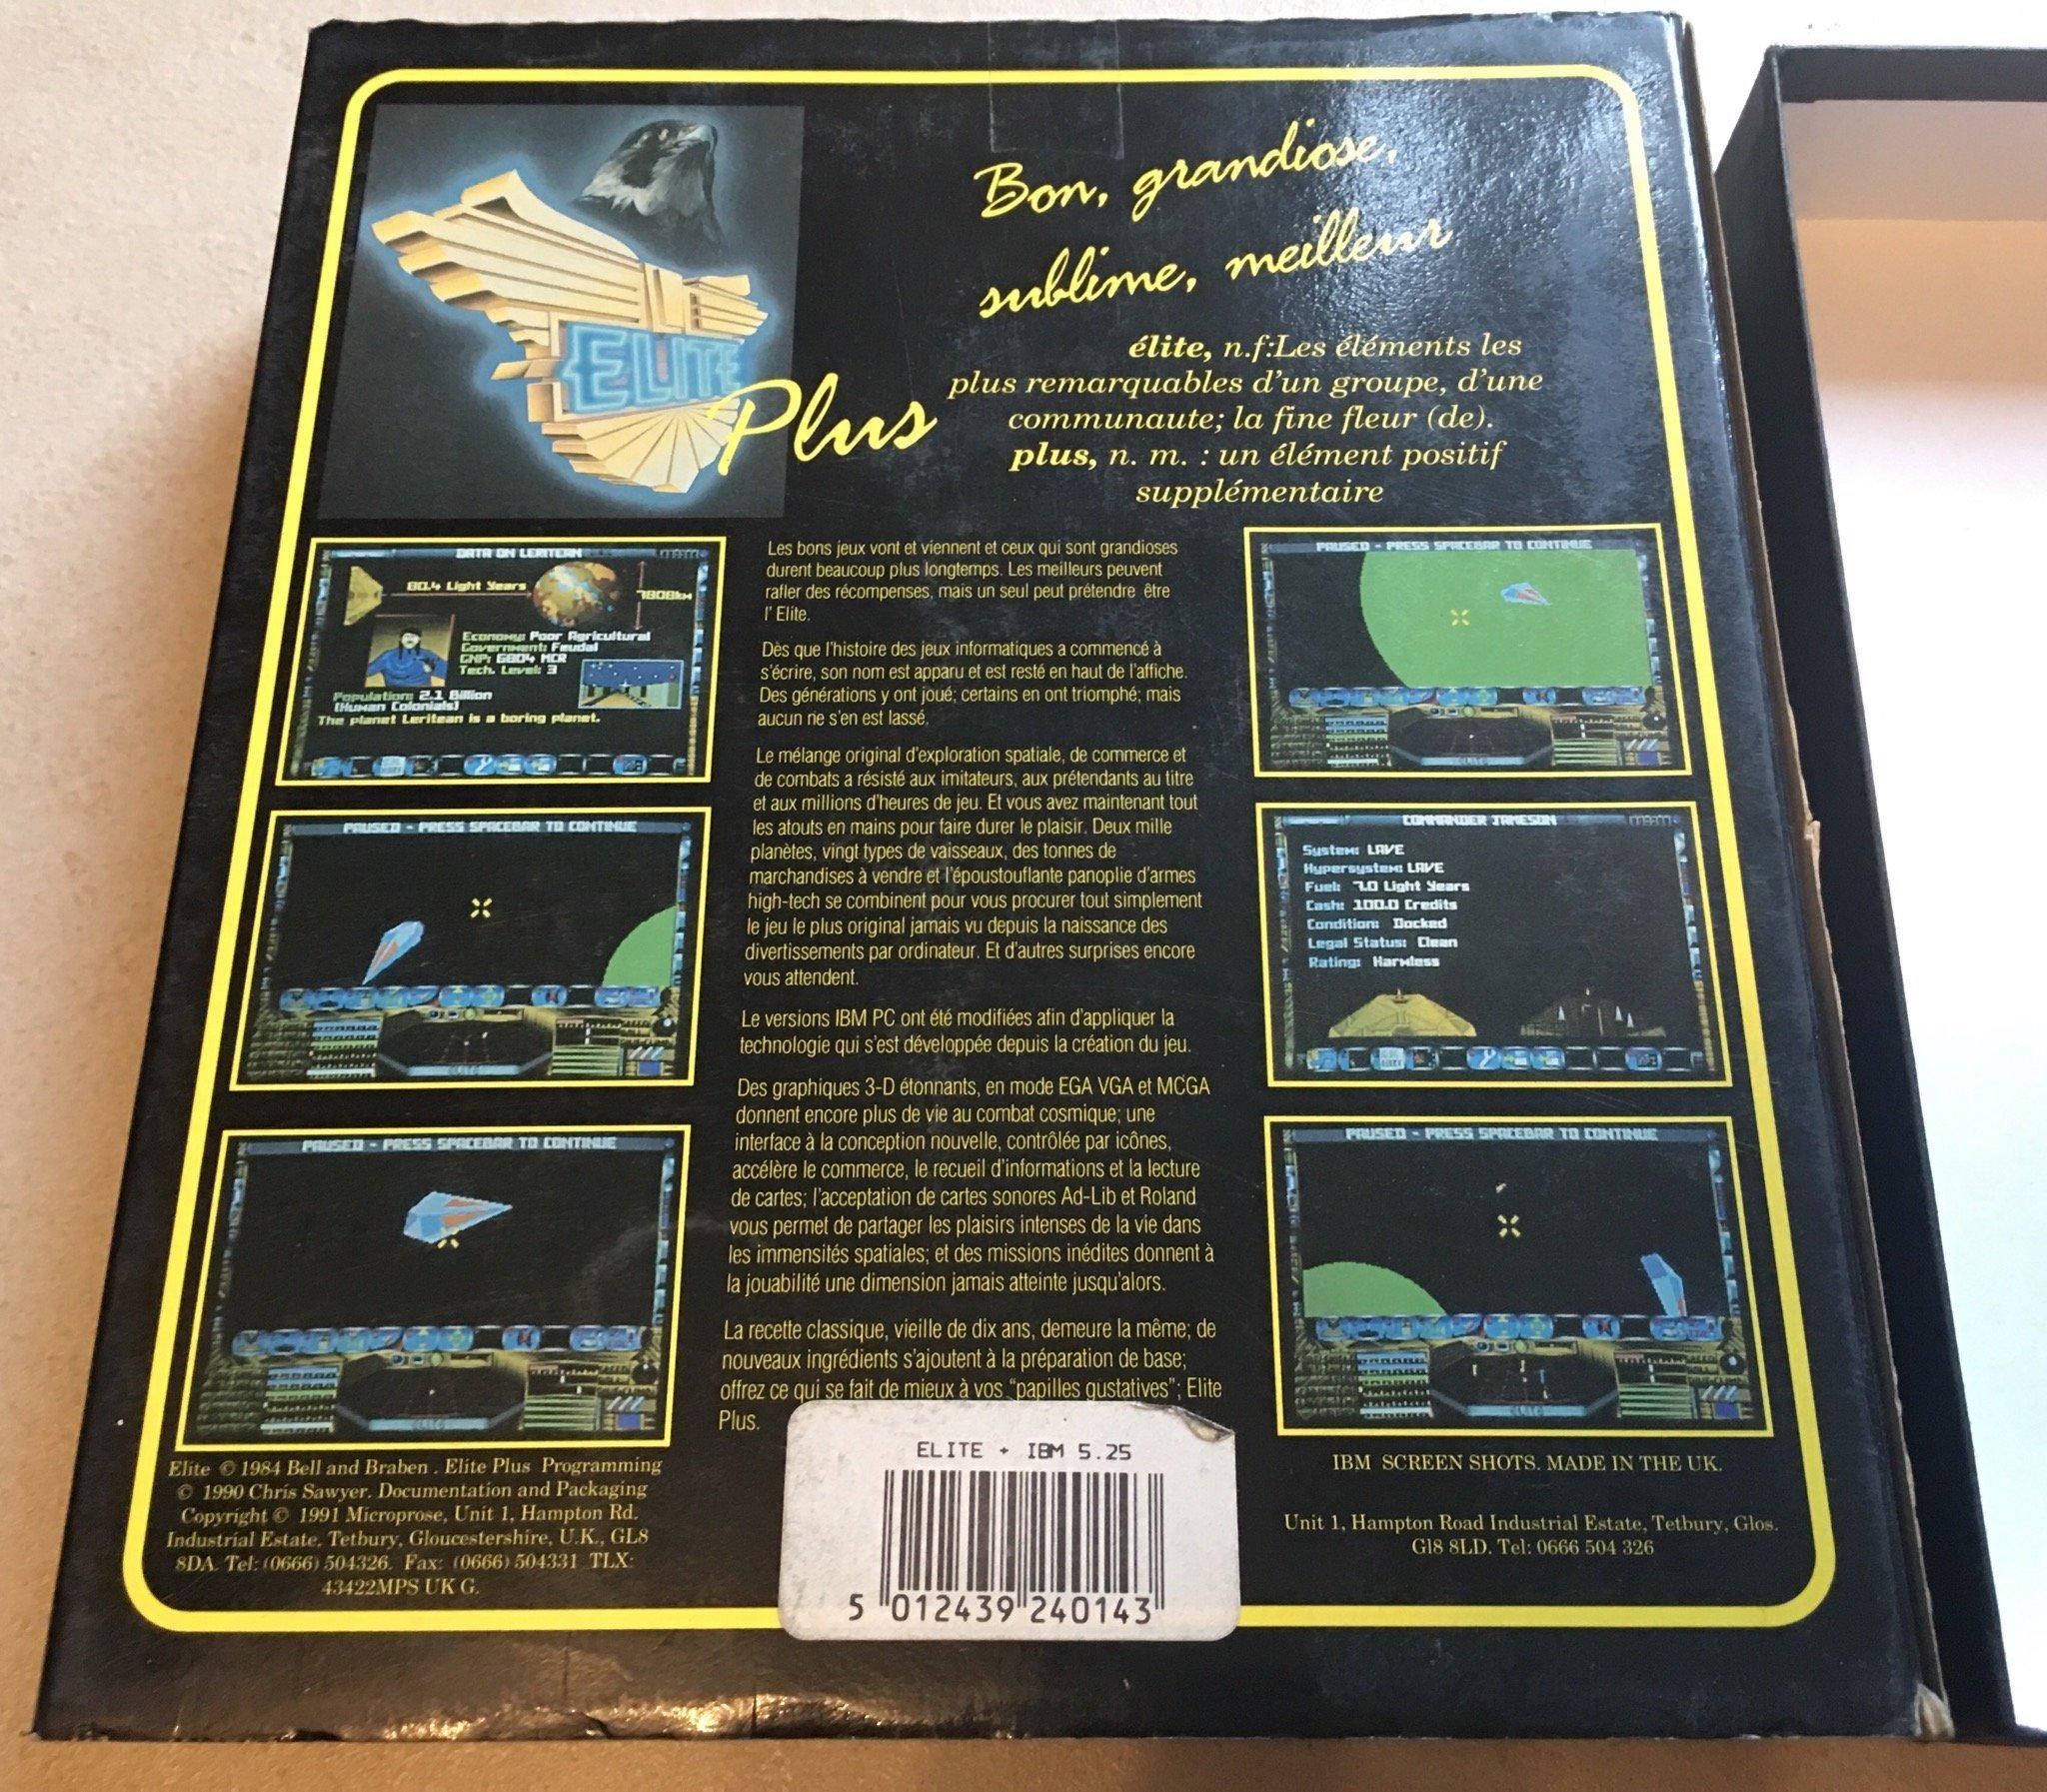 [ESTIM] Elite Plus Rainbird VF Floppy disk  1577022460-4f56756d-0969-4340-8a19-37d6980f4017